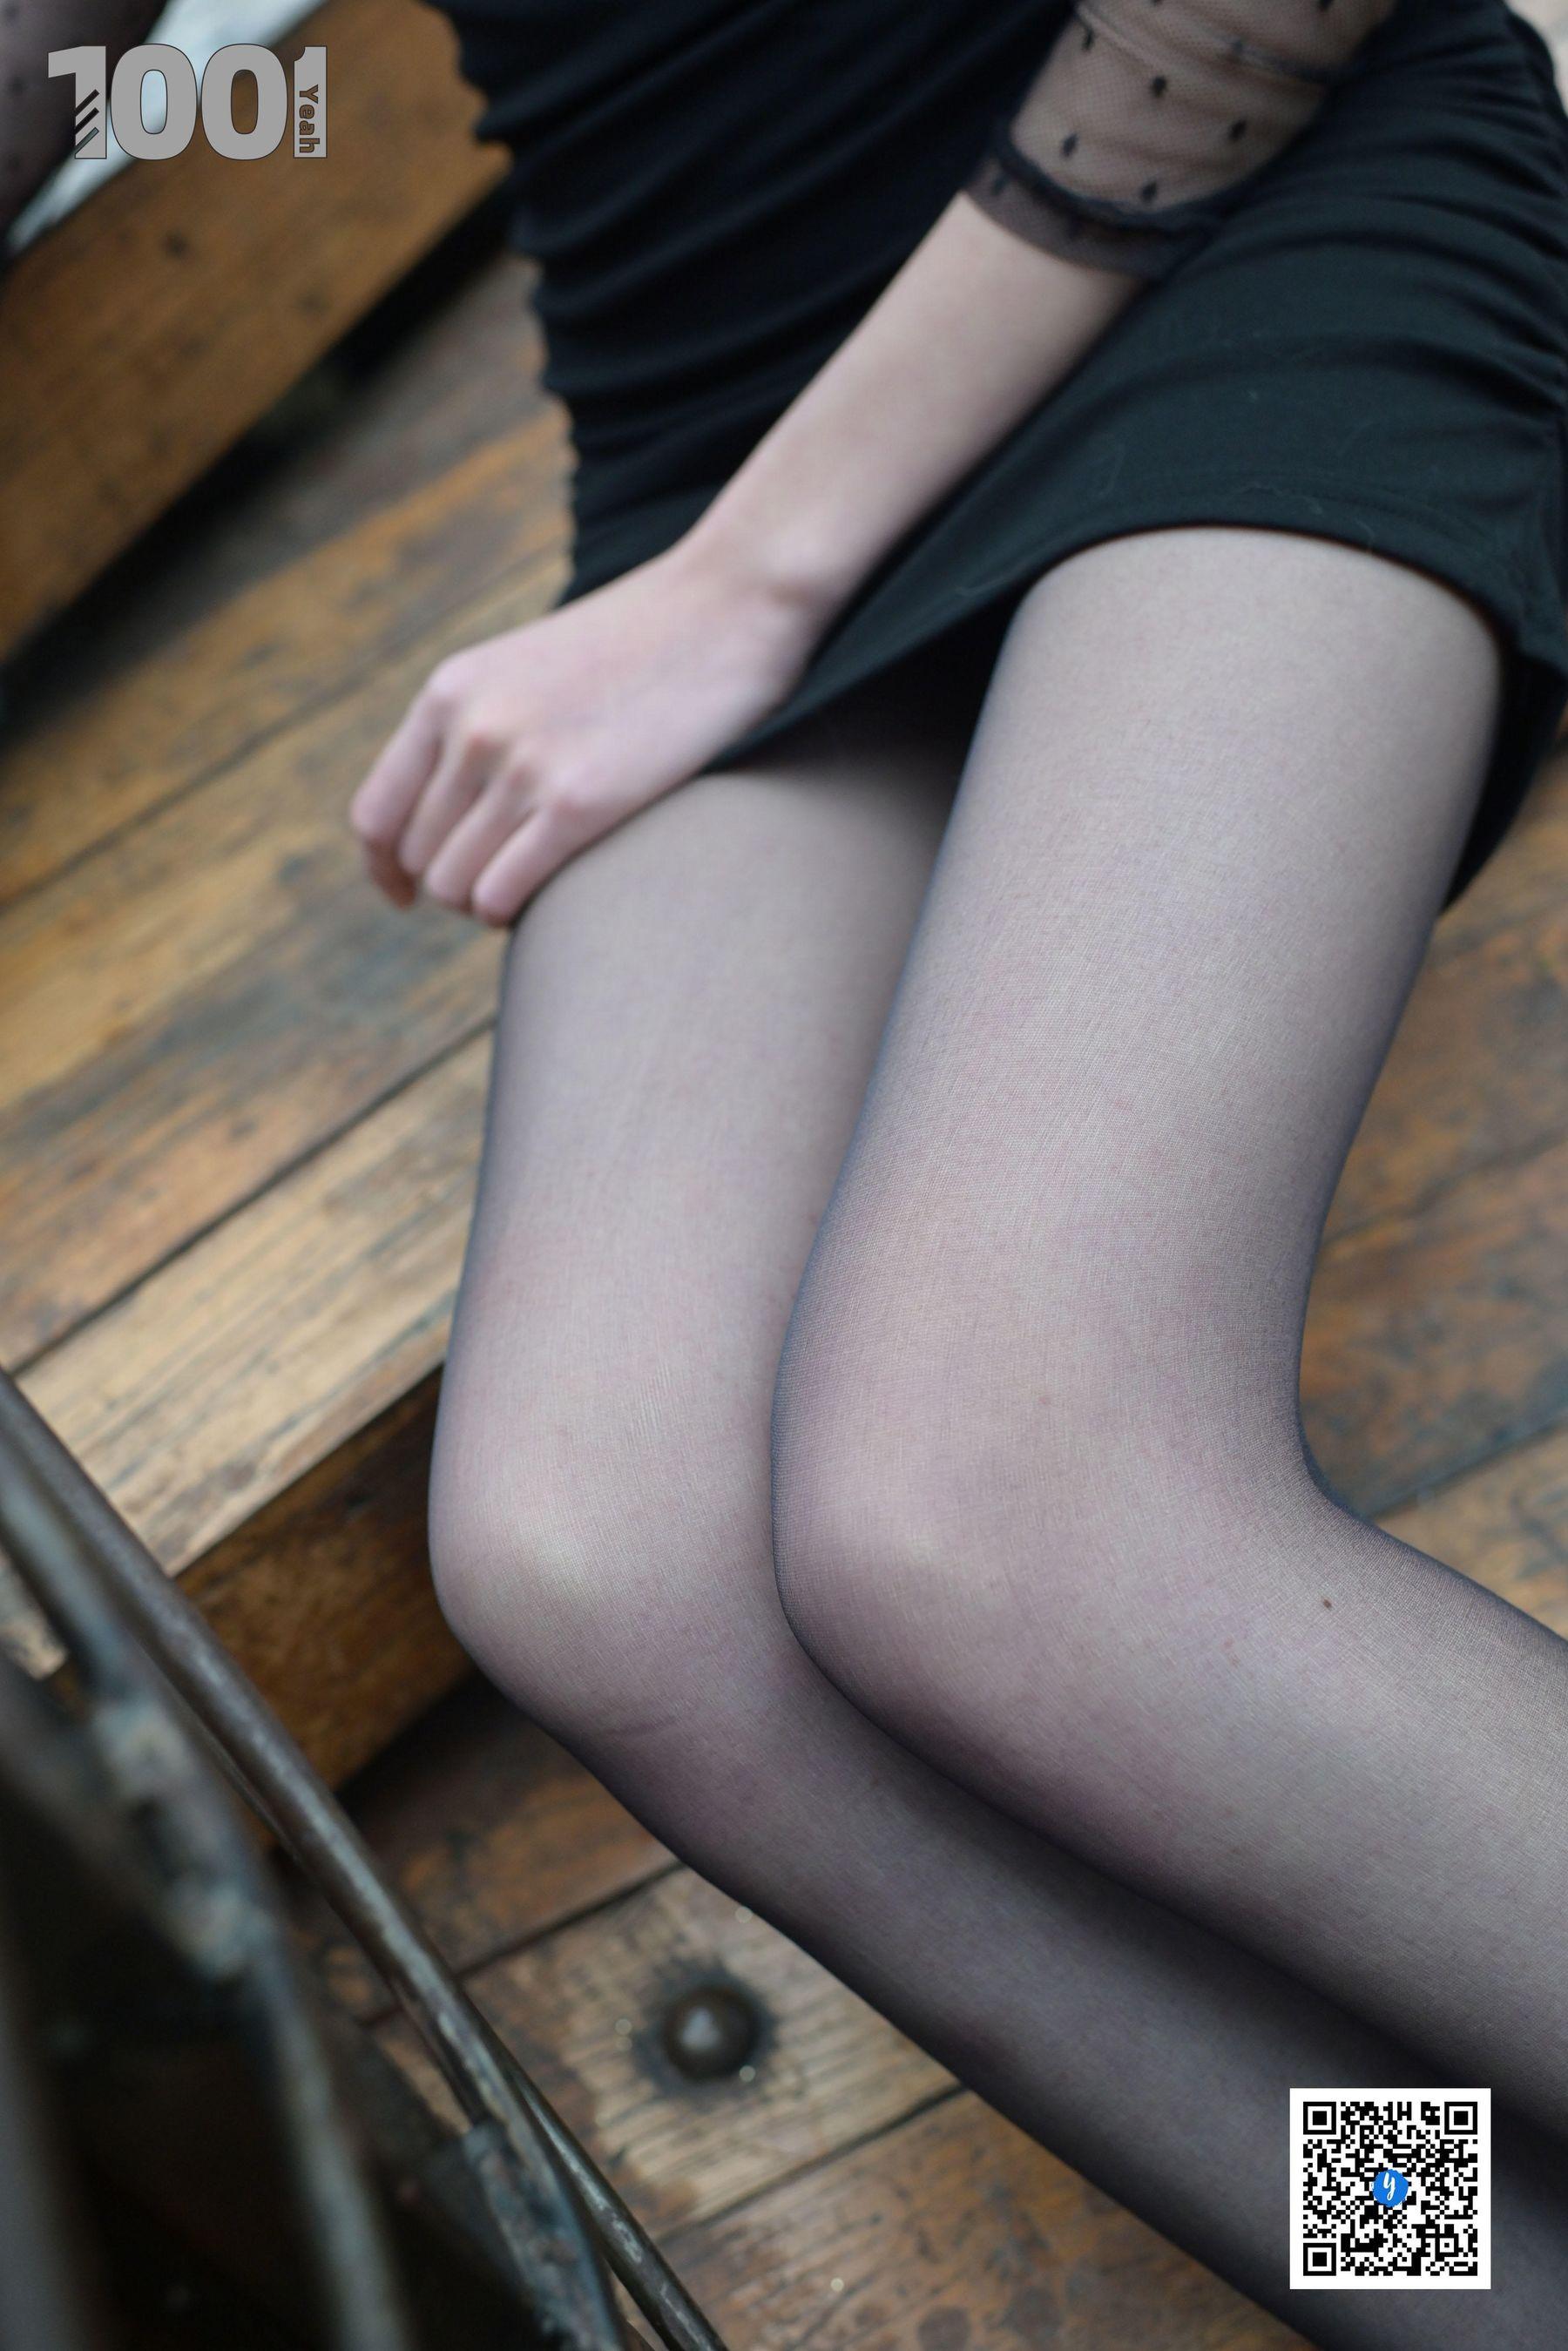 [IESS] NO.185 草莓《楼梯的拐角处2》 丝袜美腿写真[70P]插图(7)